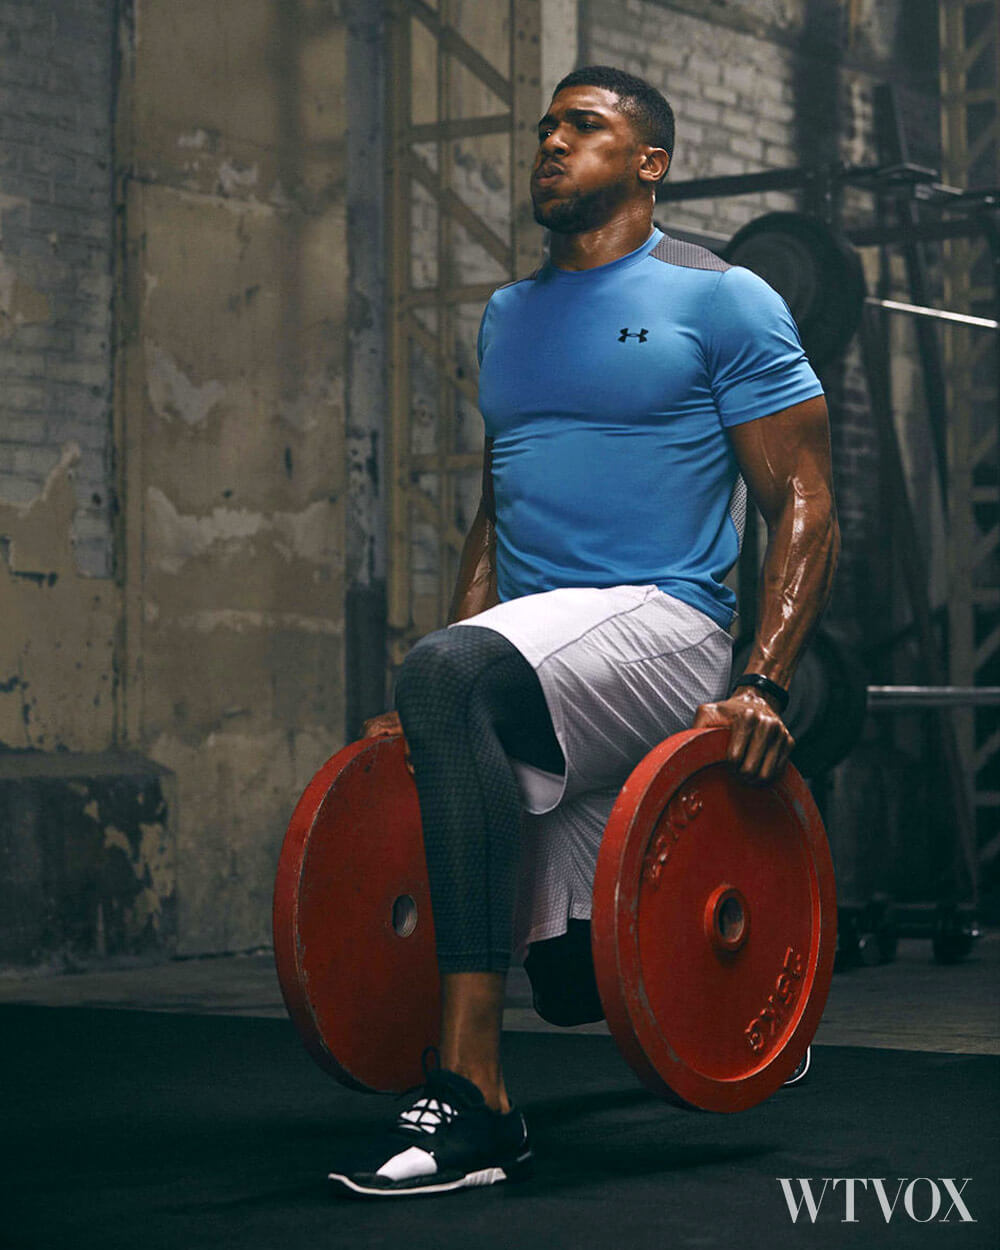 Anthony Joshua wearing Under Armour Vanish high tech sportswear during intense workout